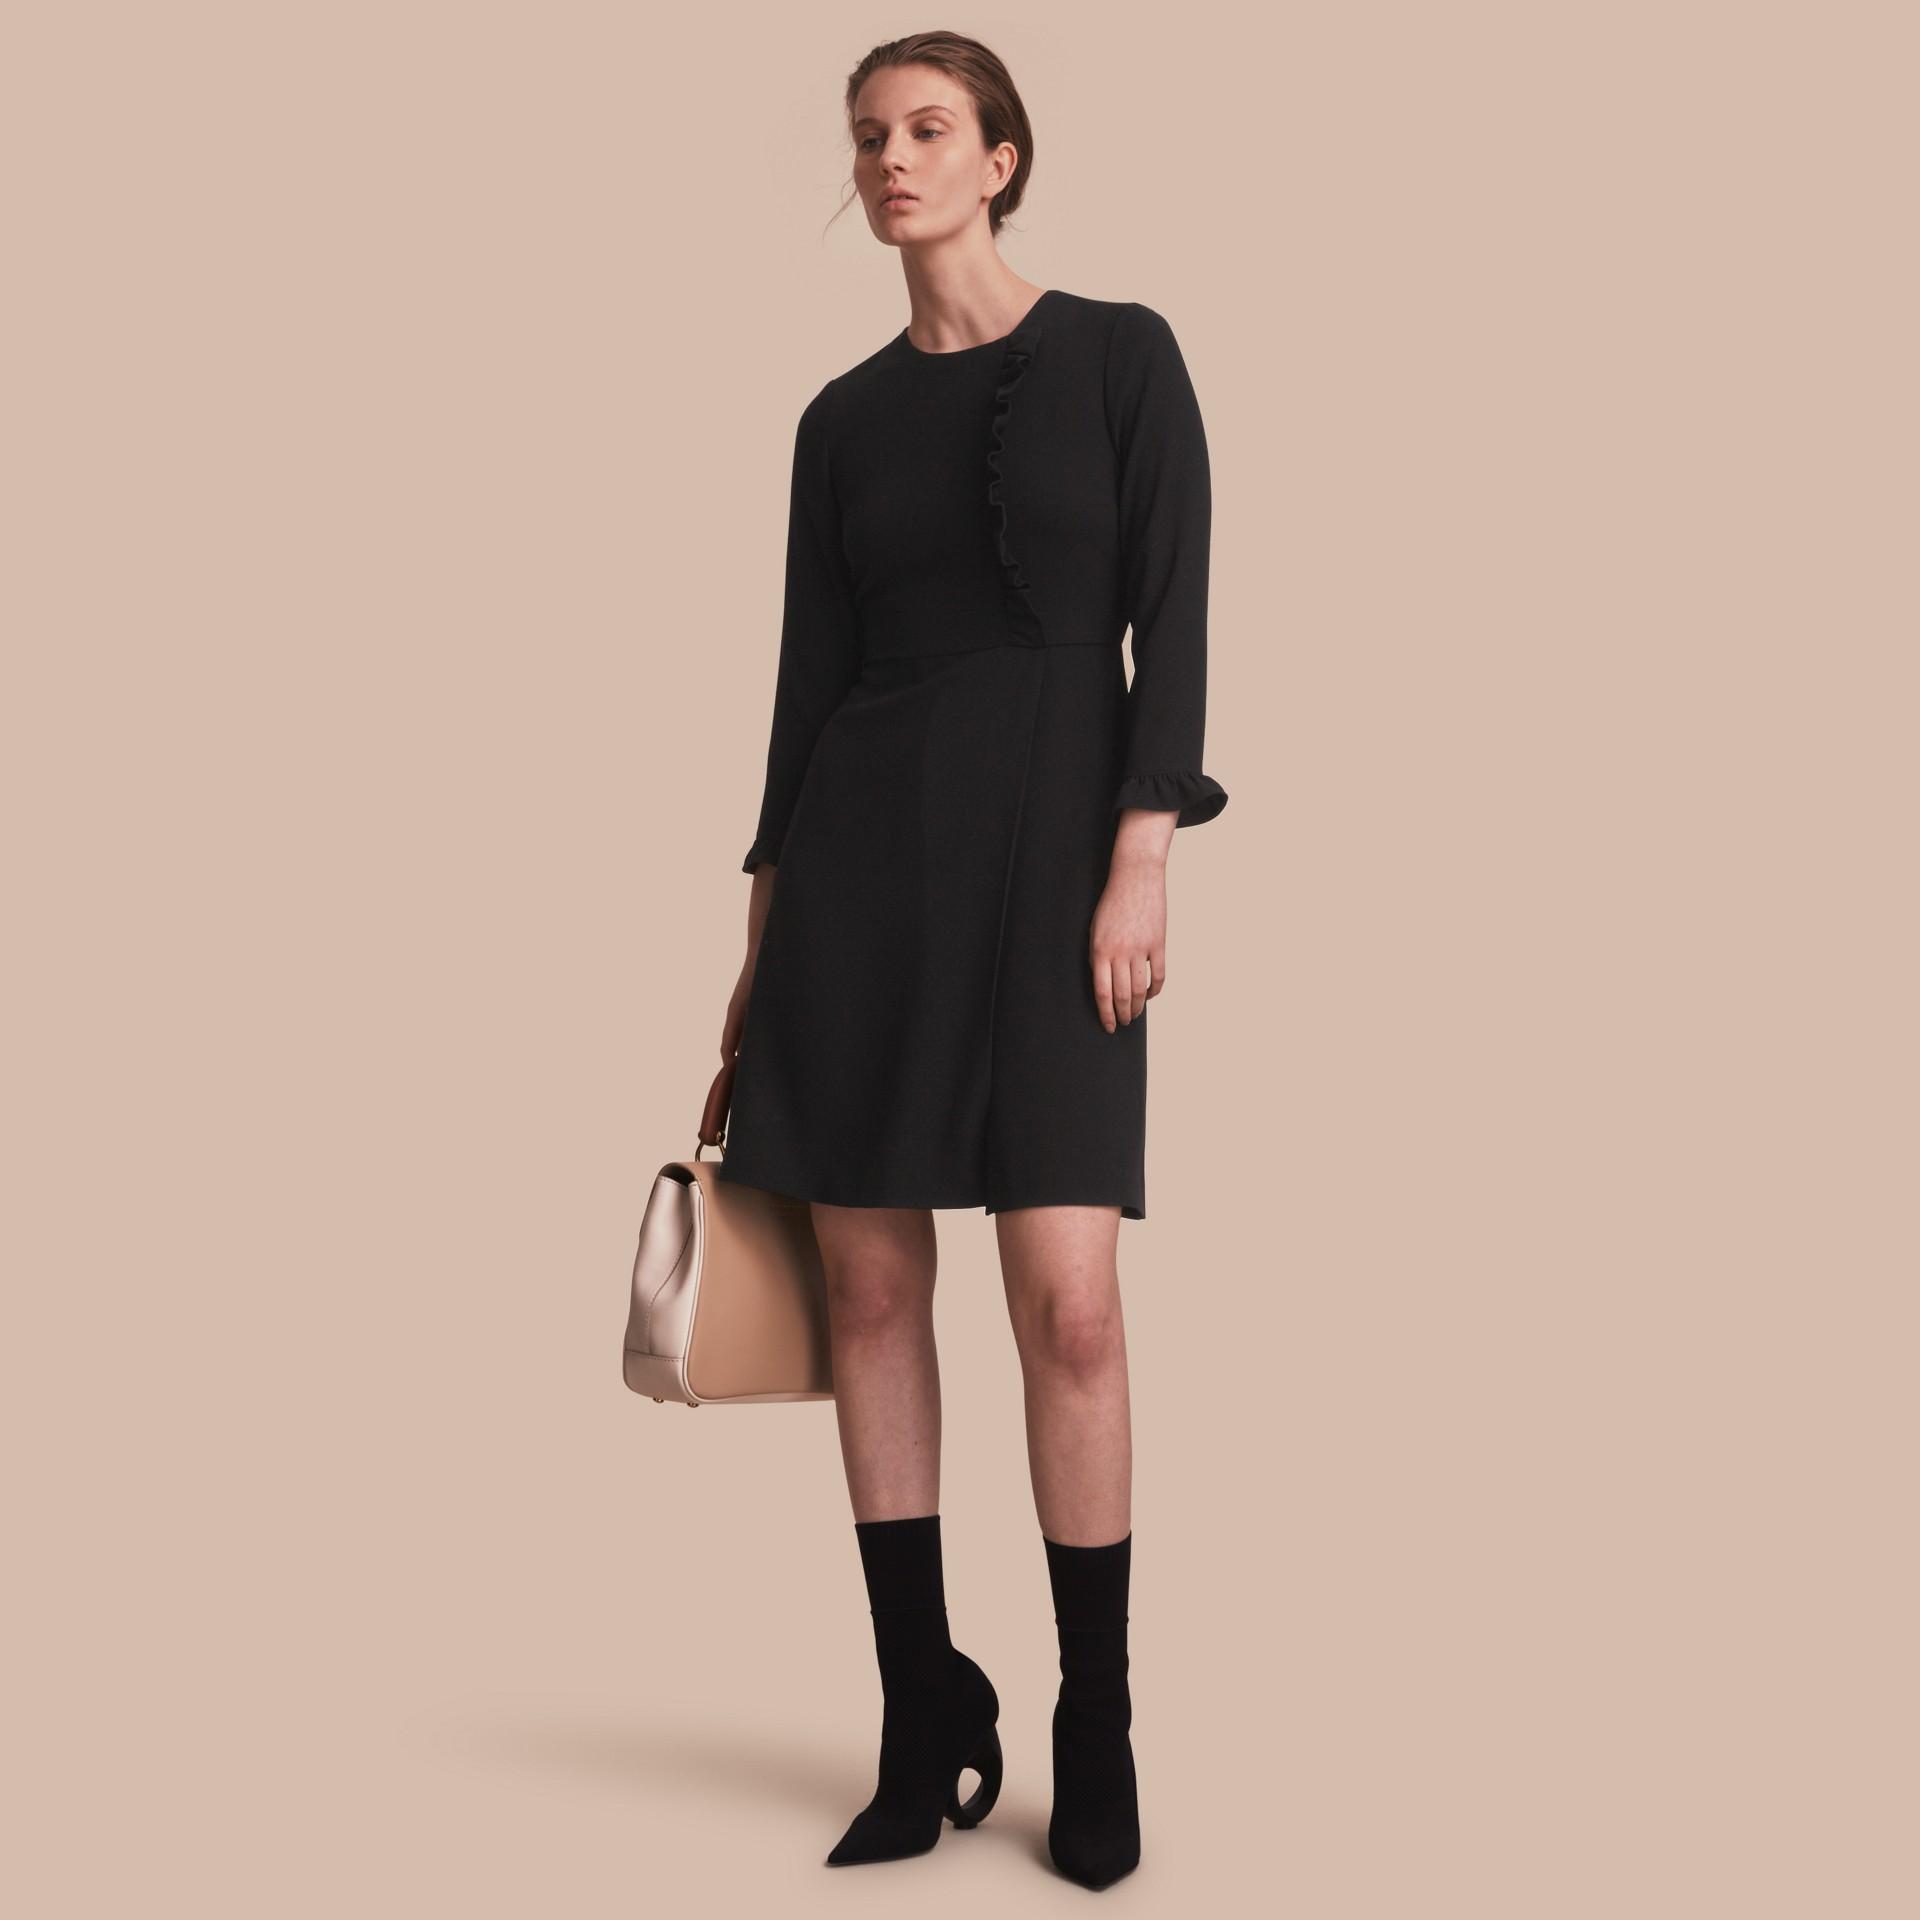 Ruffle Trim Crepe Dress - gallery image 1